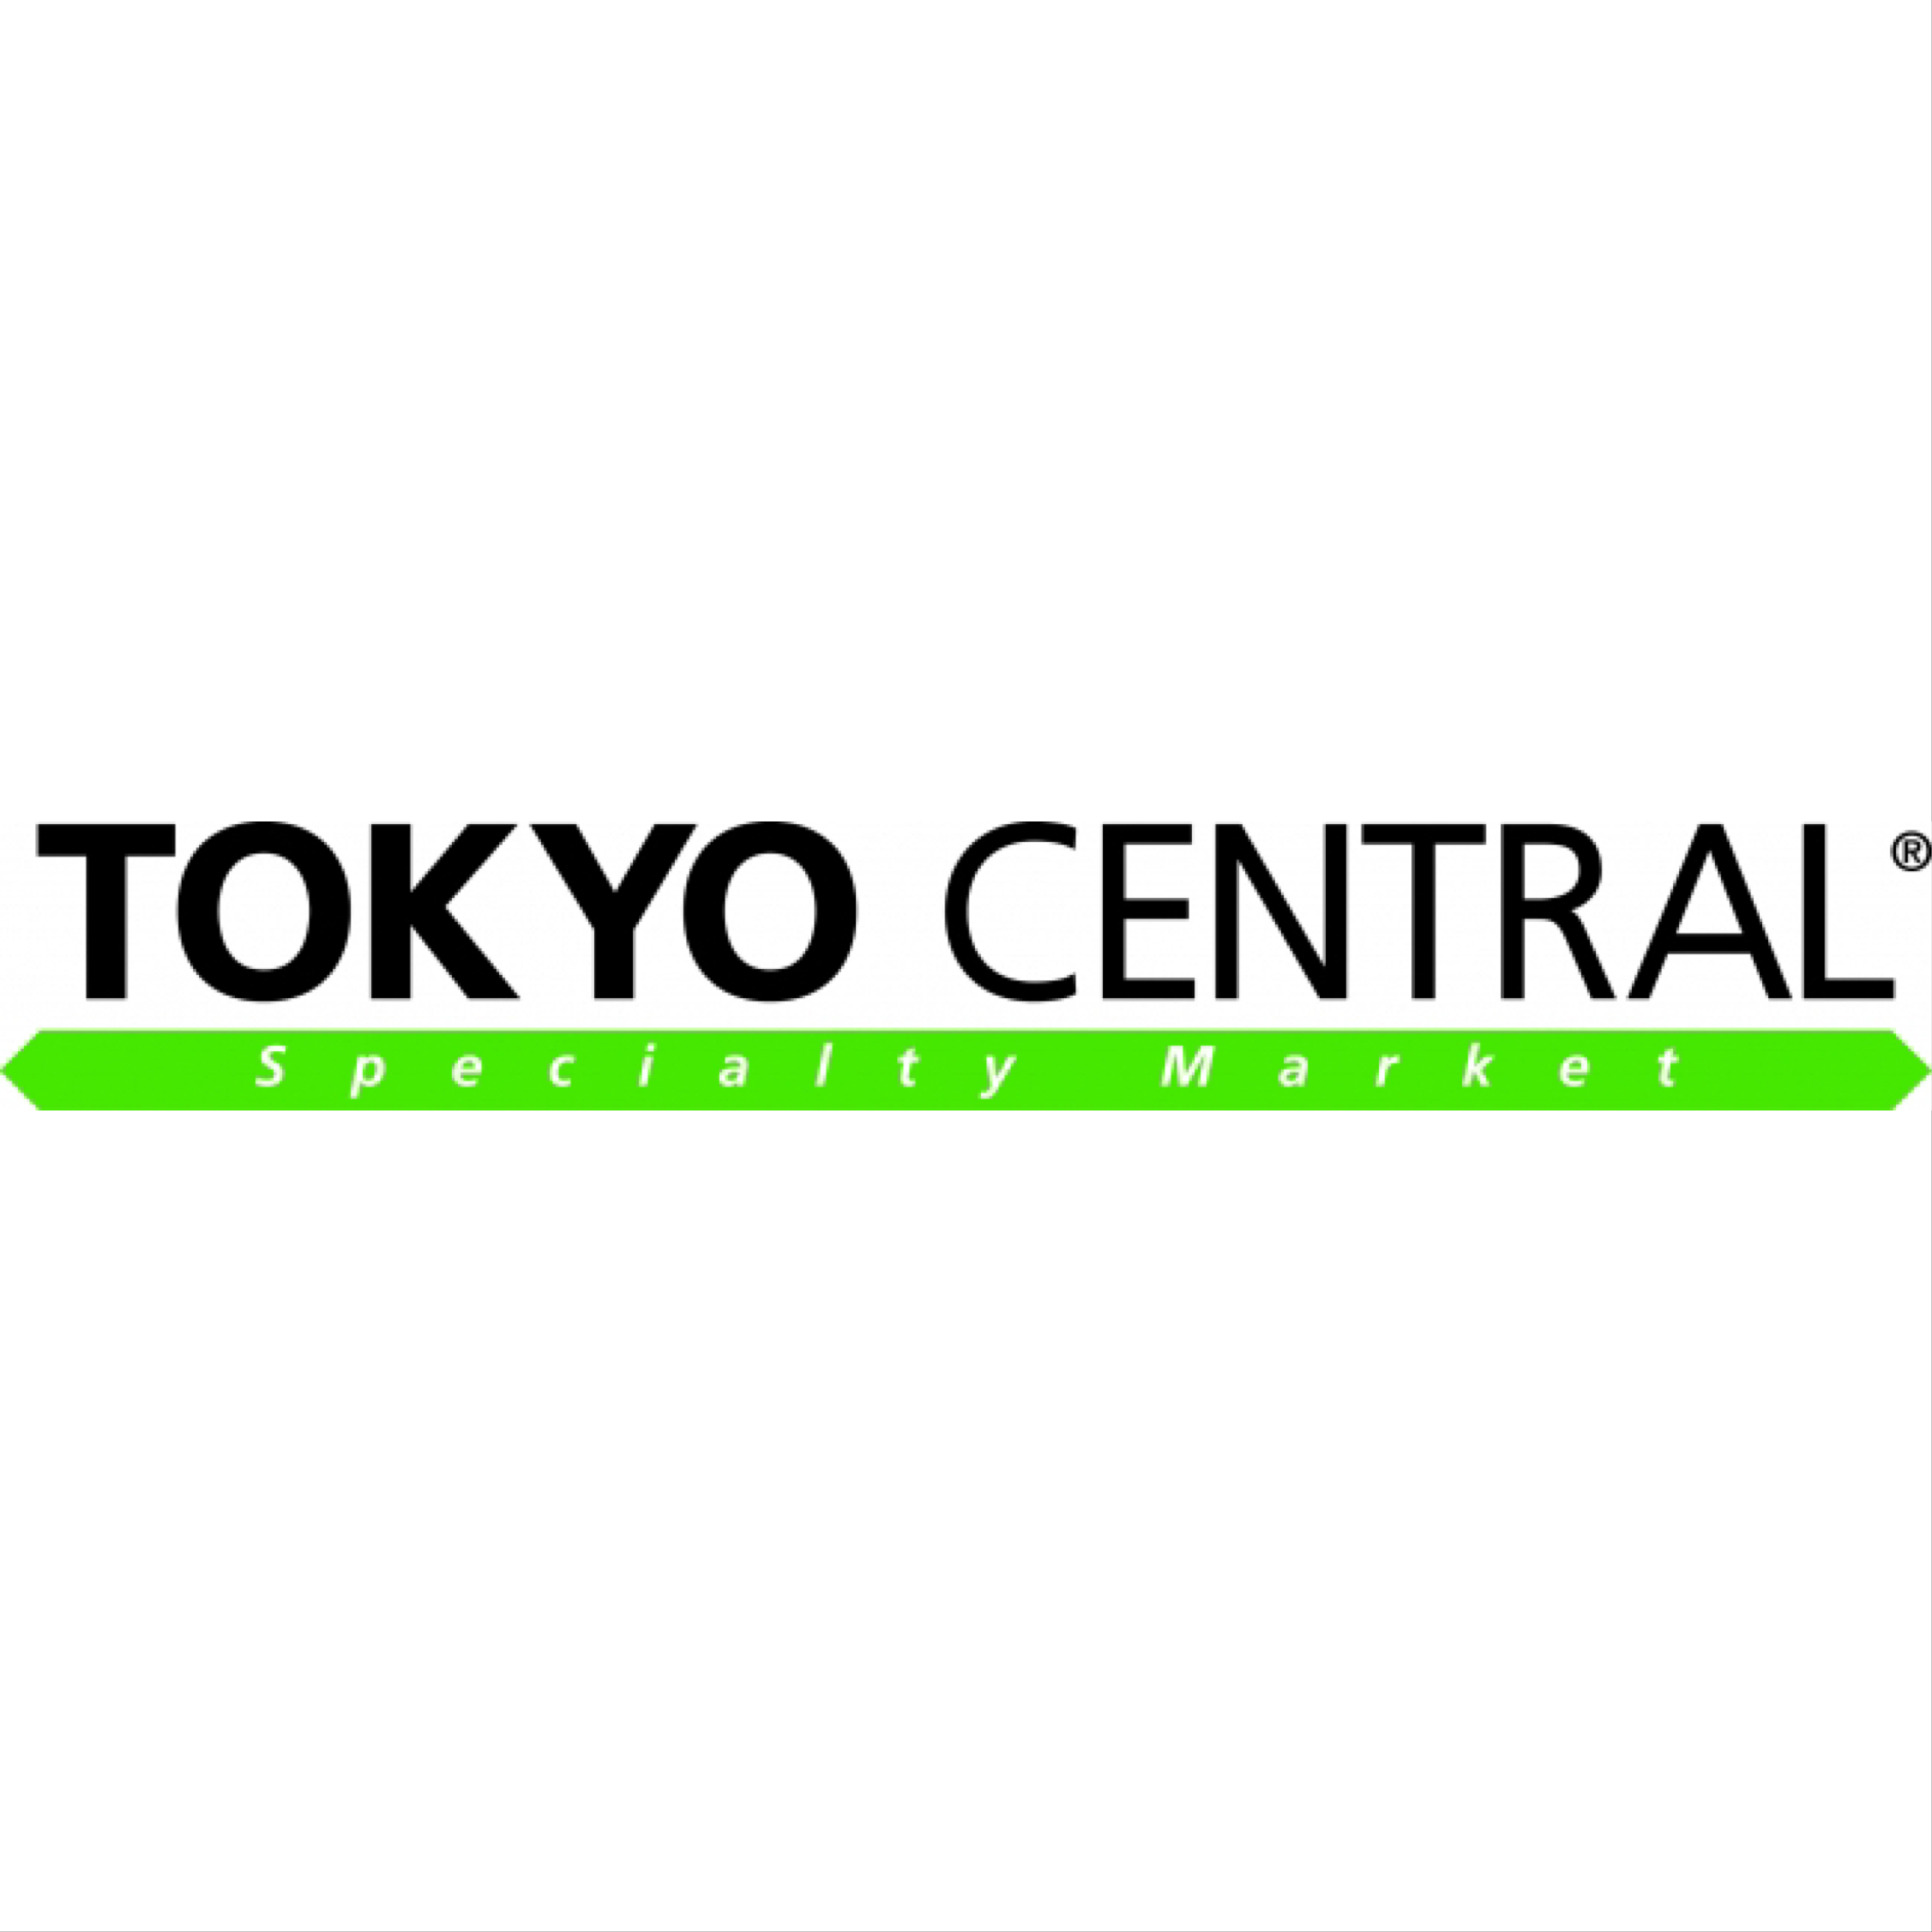 tokyocenteral